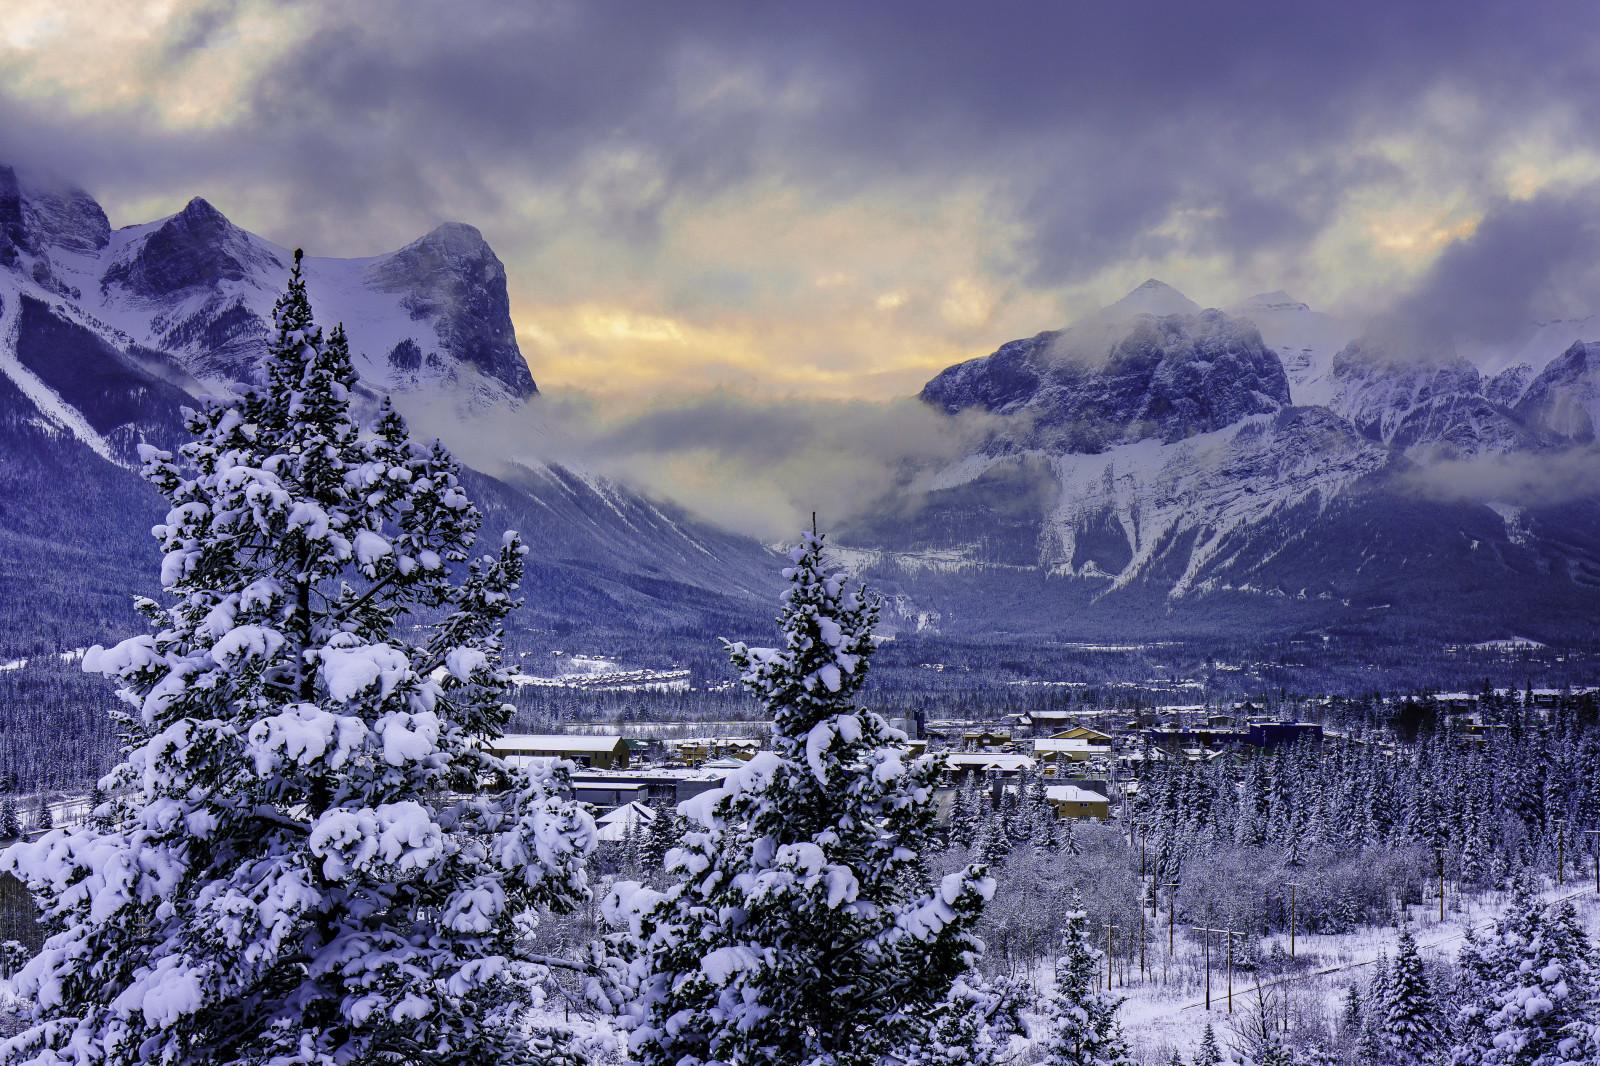 Fond D Ecran Canada Montagne Alberta Parc National De Banff Neige Hiver 4200x2800 Coolwallpapers 997414 Fond D Ecran Wallhere